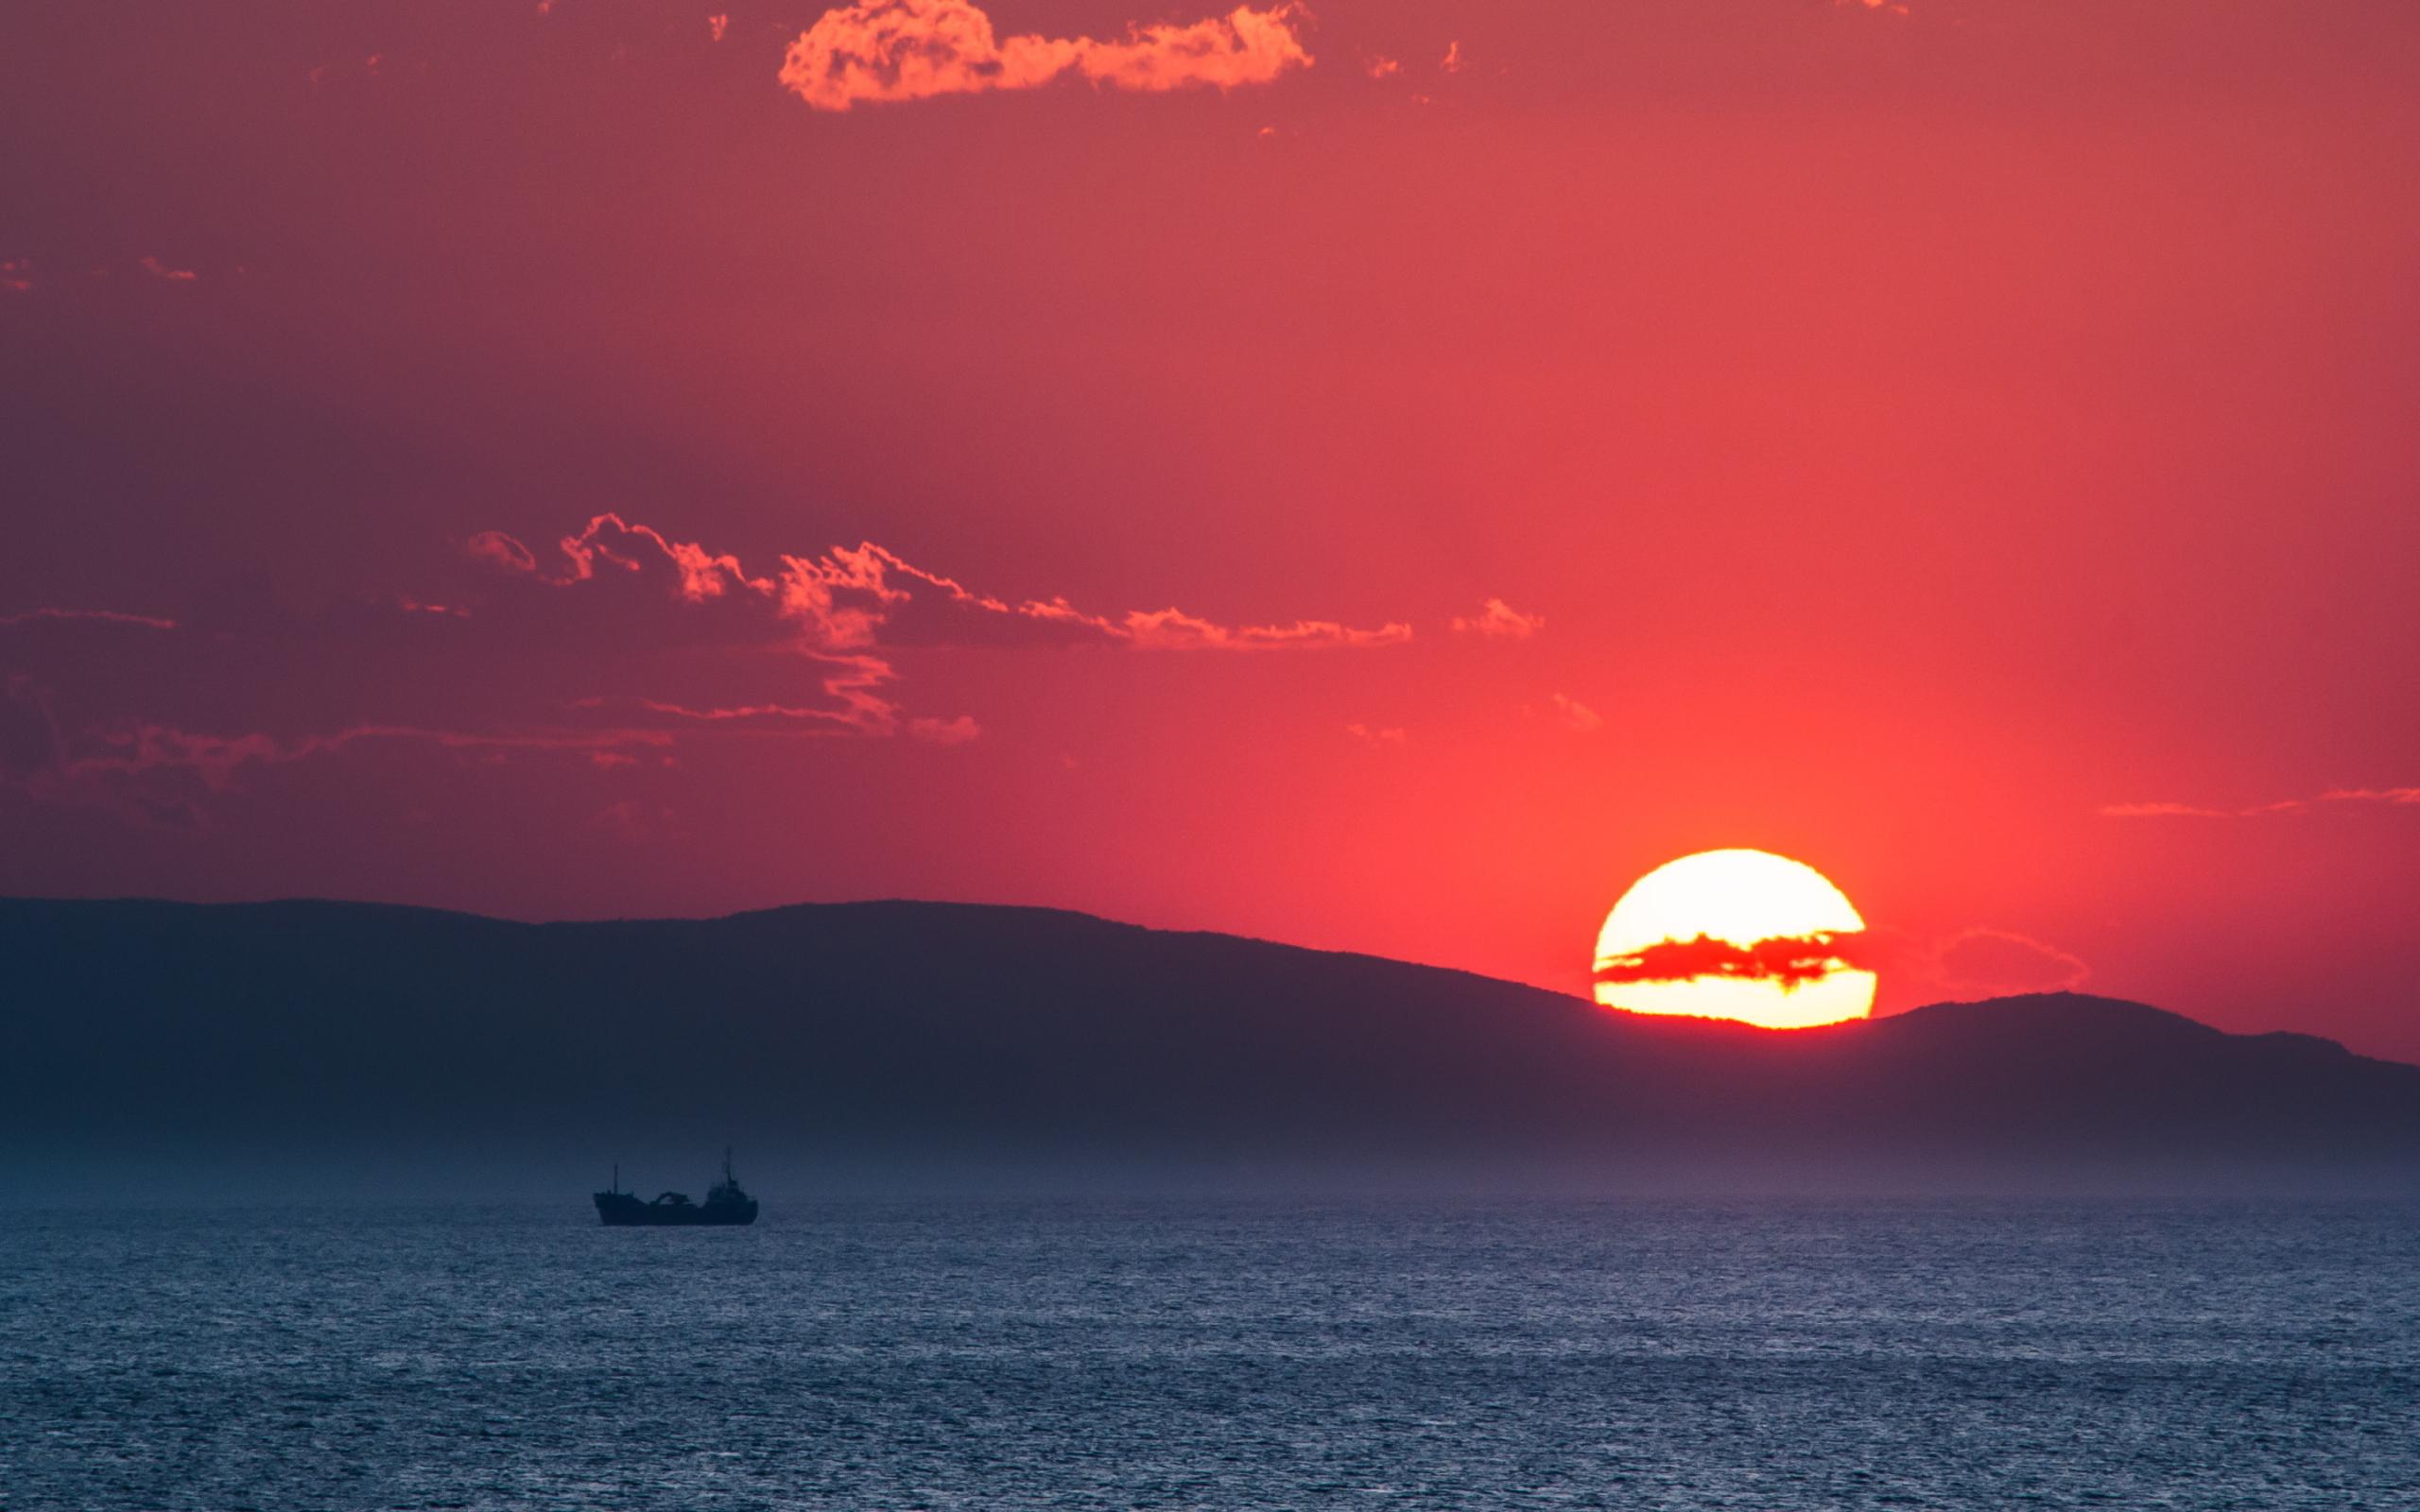 Sunset evian gulf greece